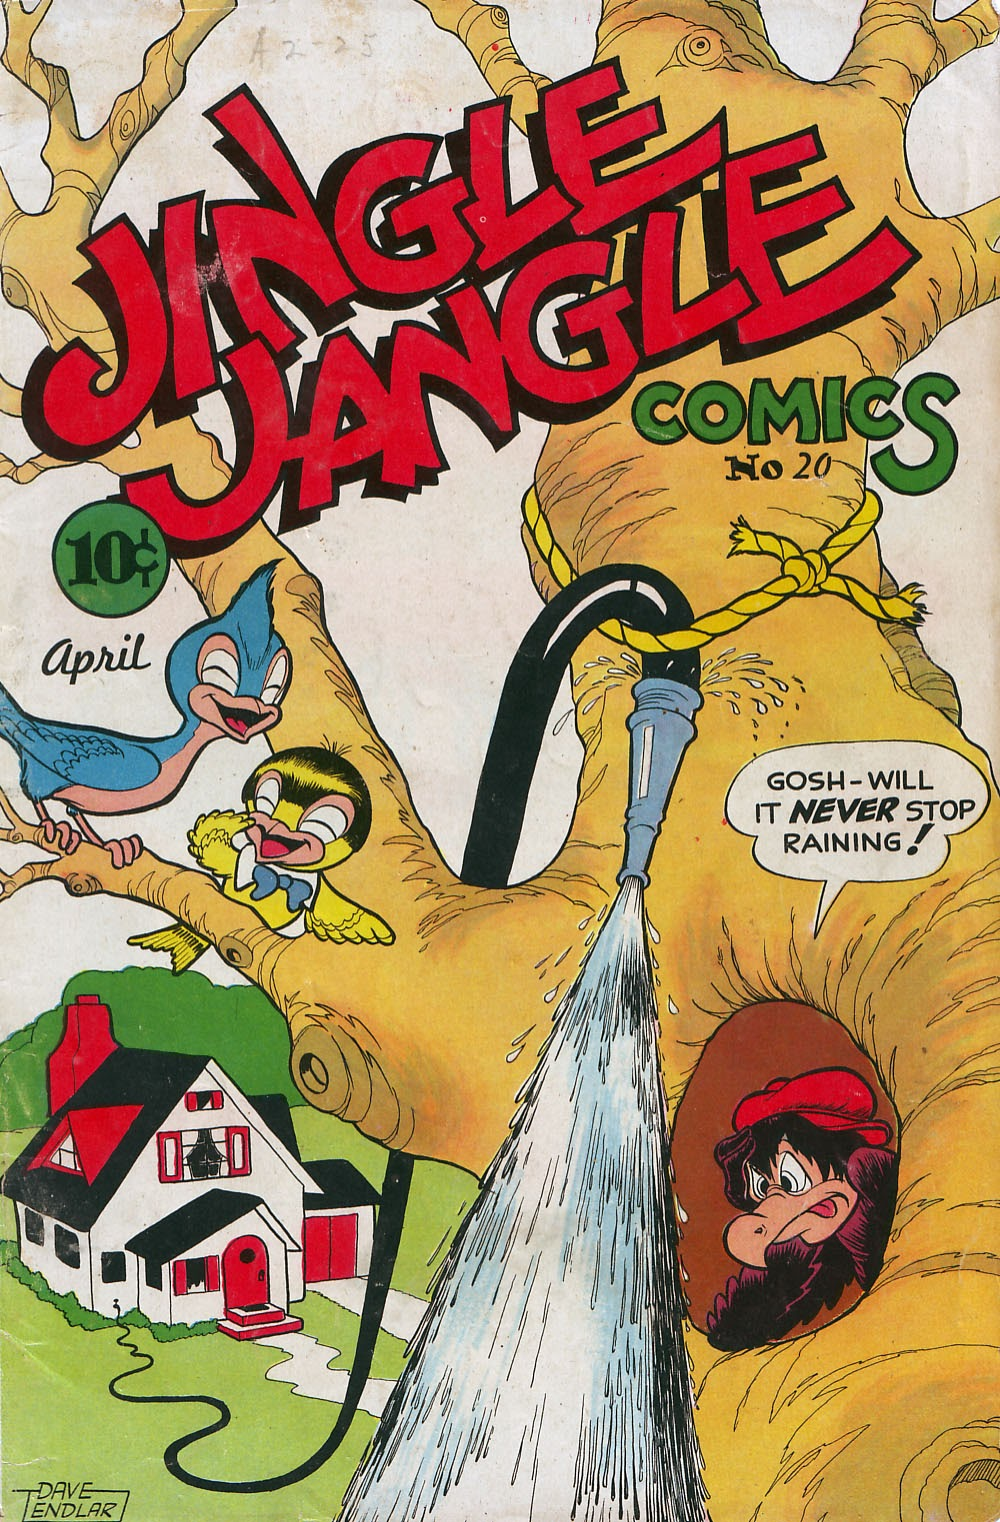 Jingle Jangle Comics 20 Page 1